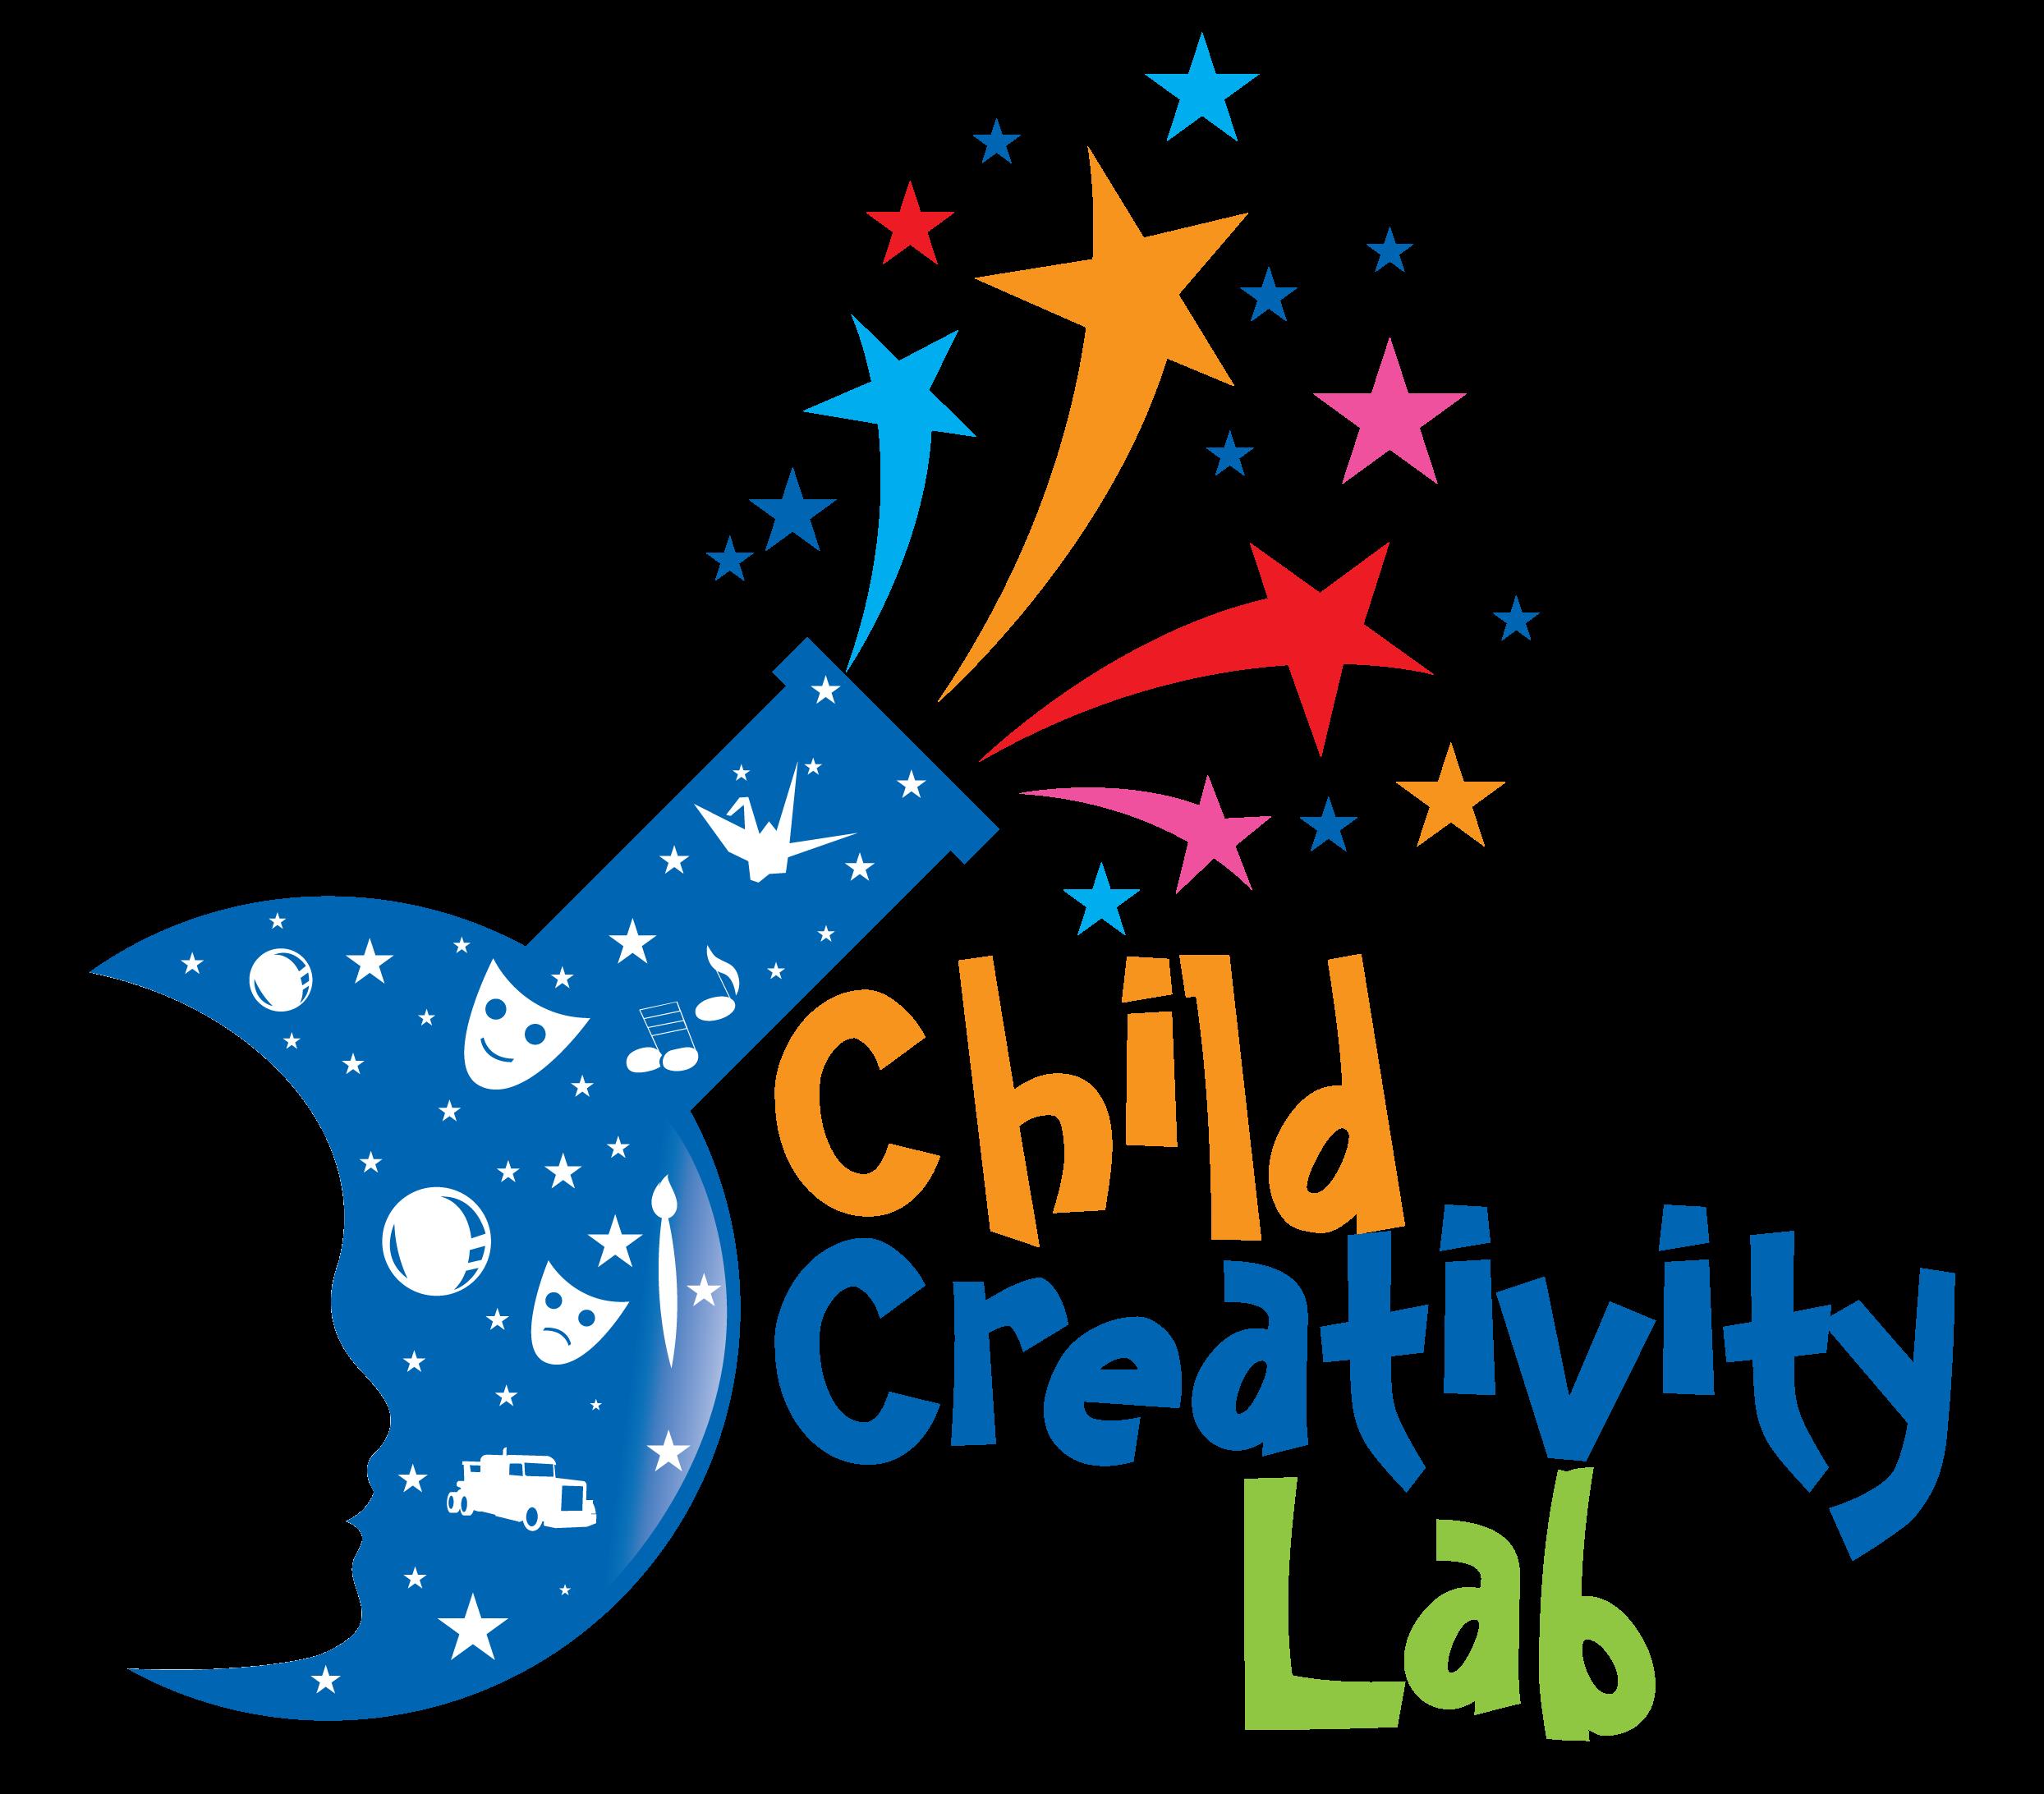 Child-Creativity-Lab_Final_Transparent_Logo.png